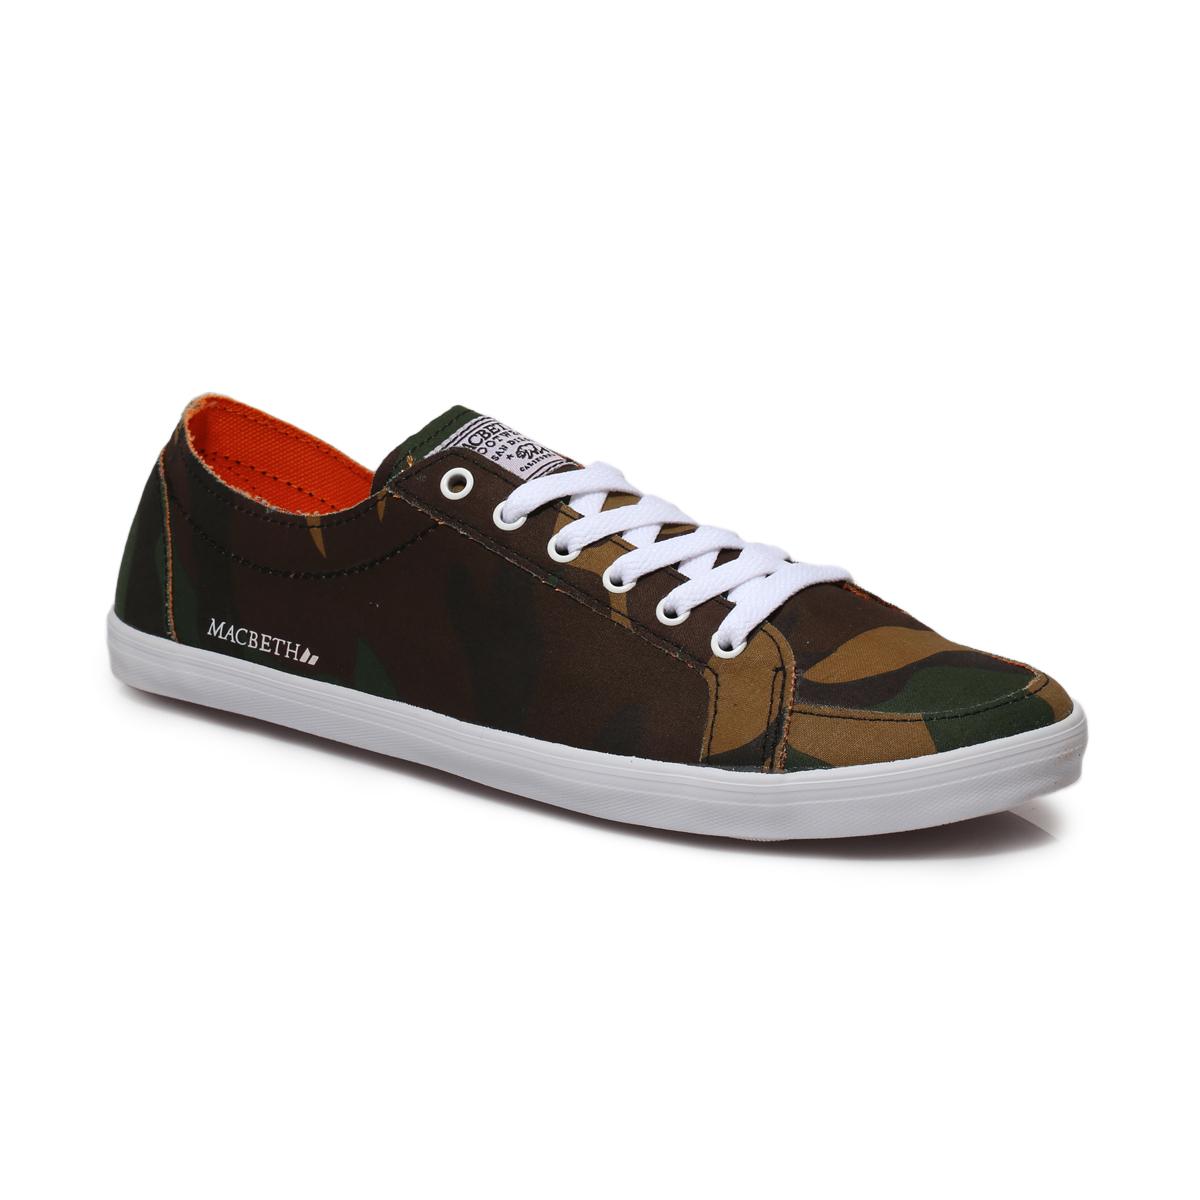 Macbeth Shoes For Ladies